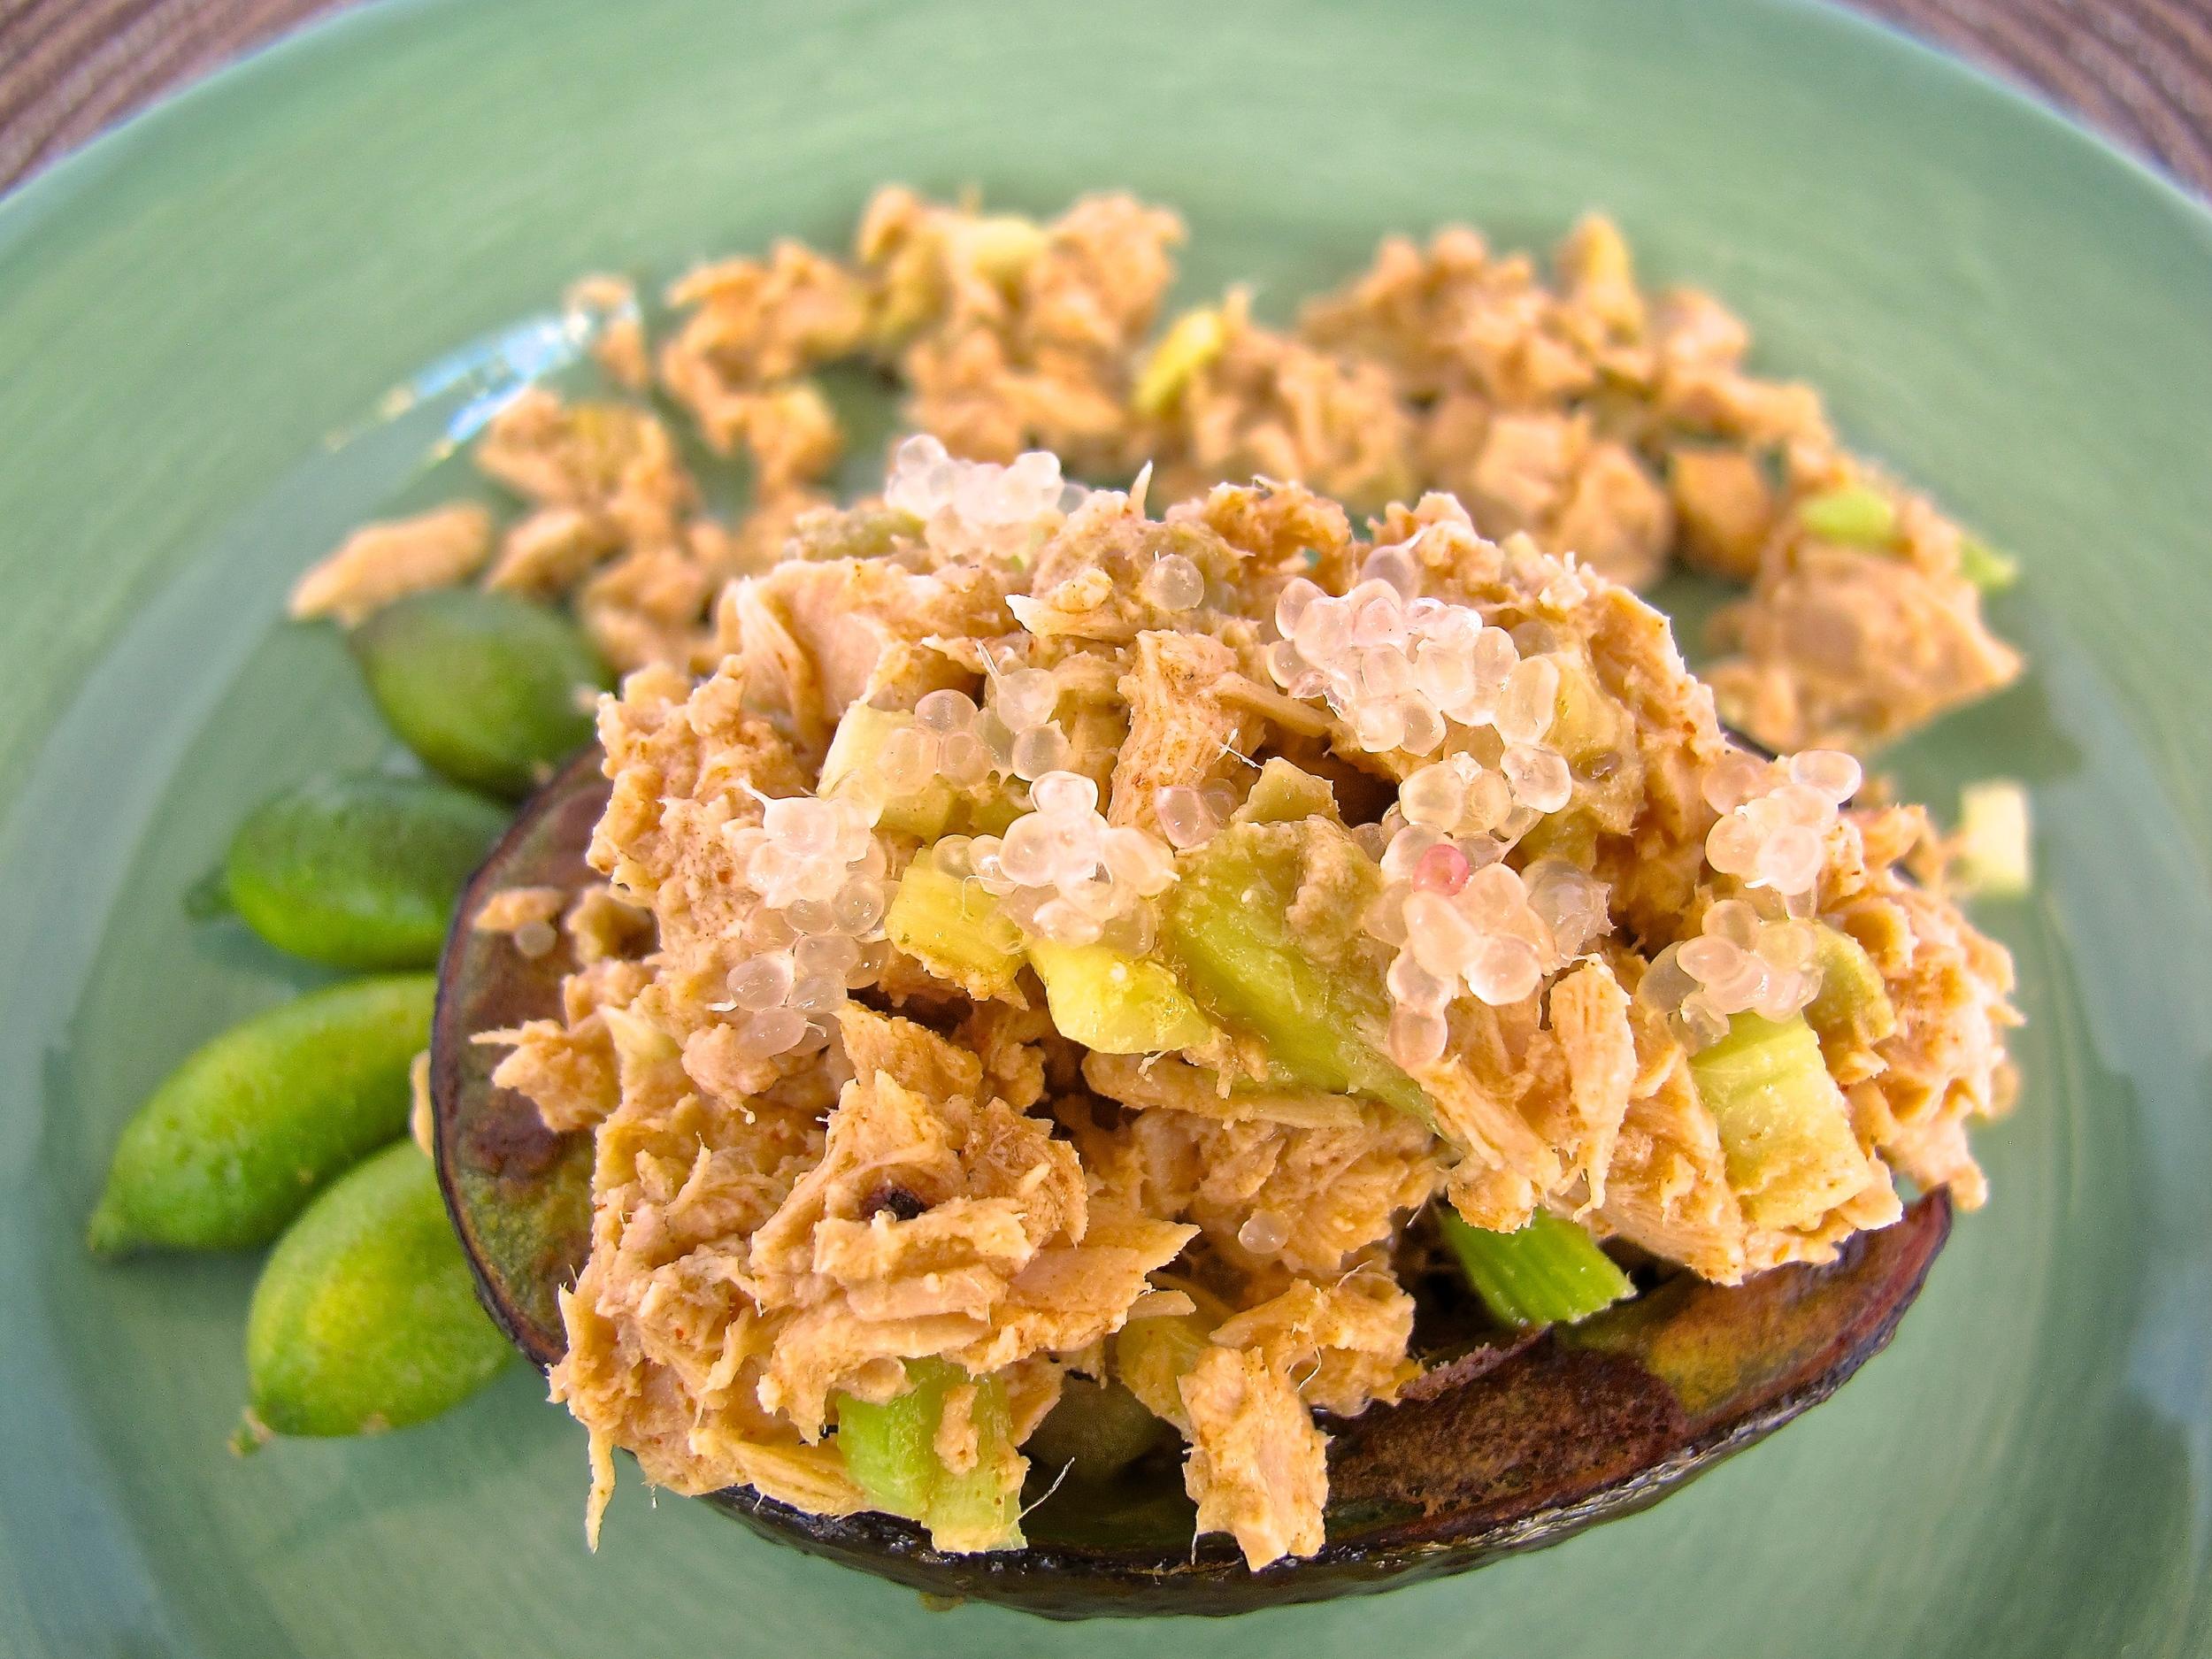 Tuna Stuffed Avocado with Finger Lime Vinaigrette